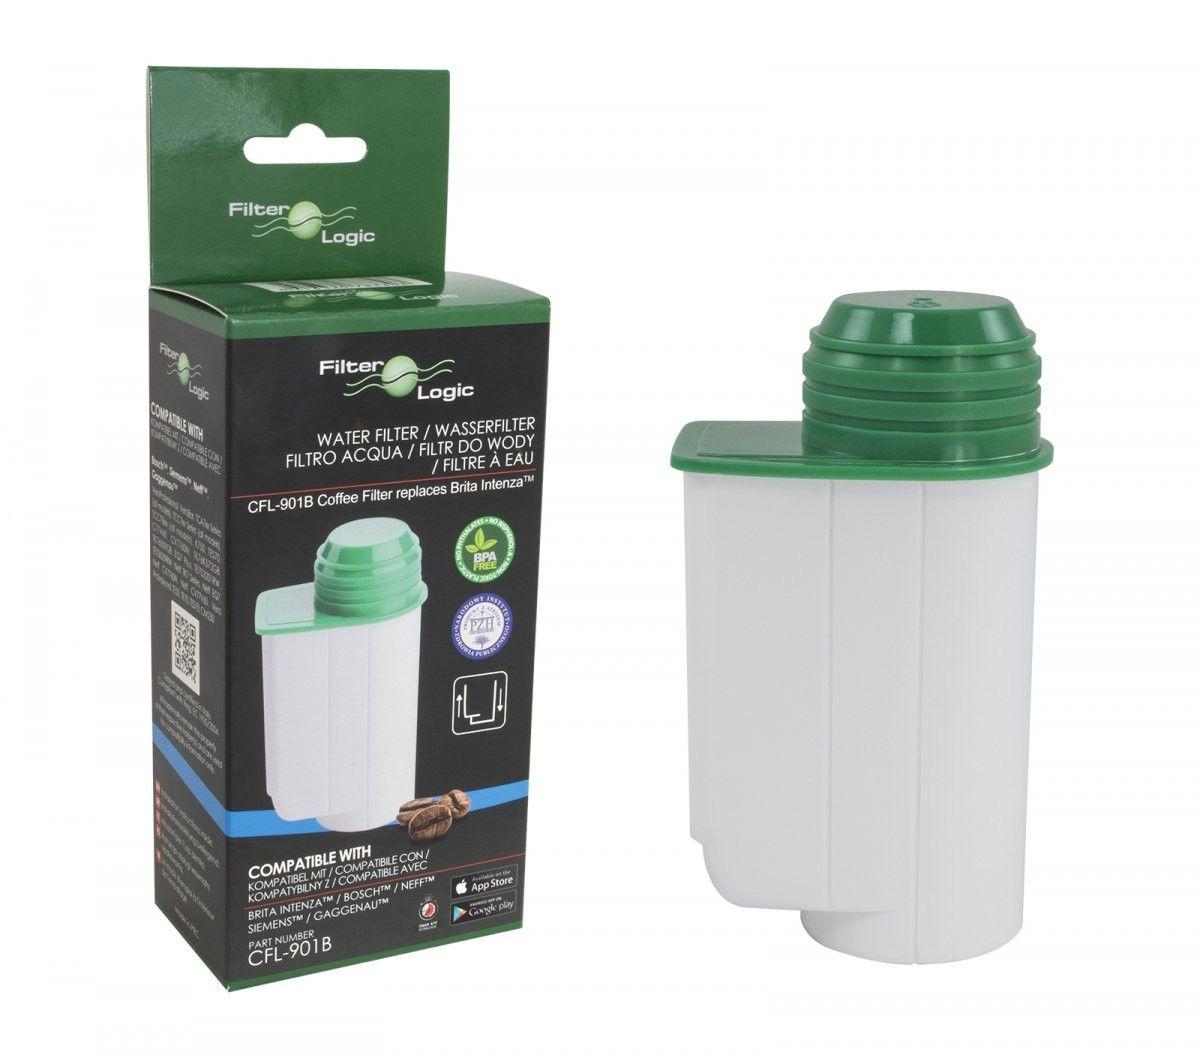 Filtr wody Brita Intenza+ CA6702 ekspresu do kawy 3szt FilterLogic